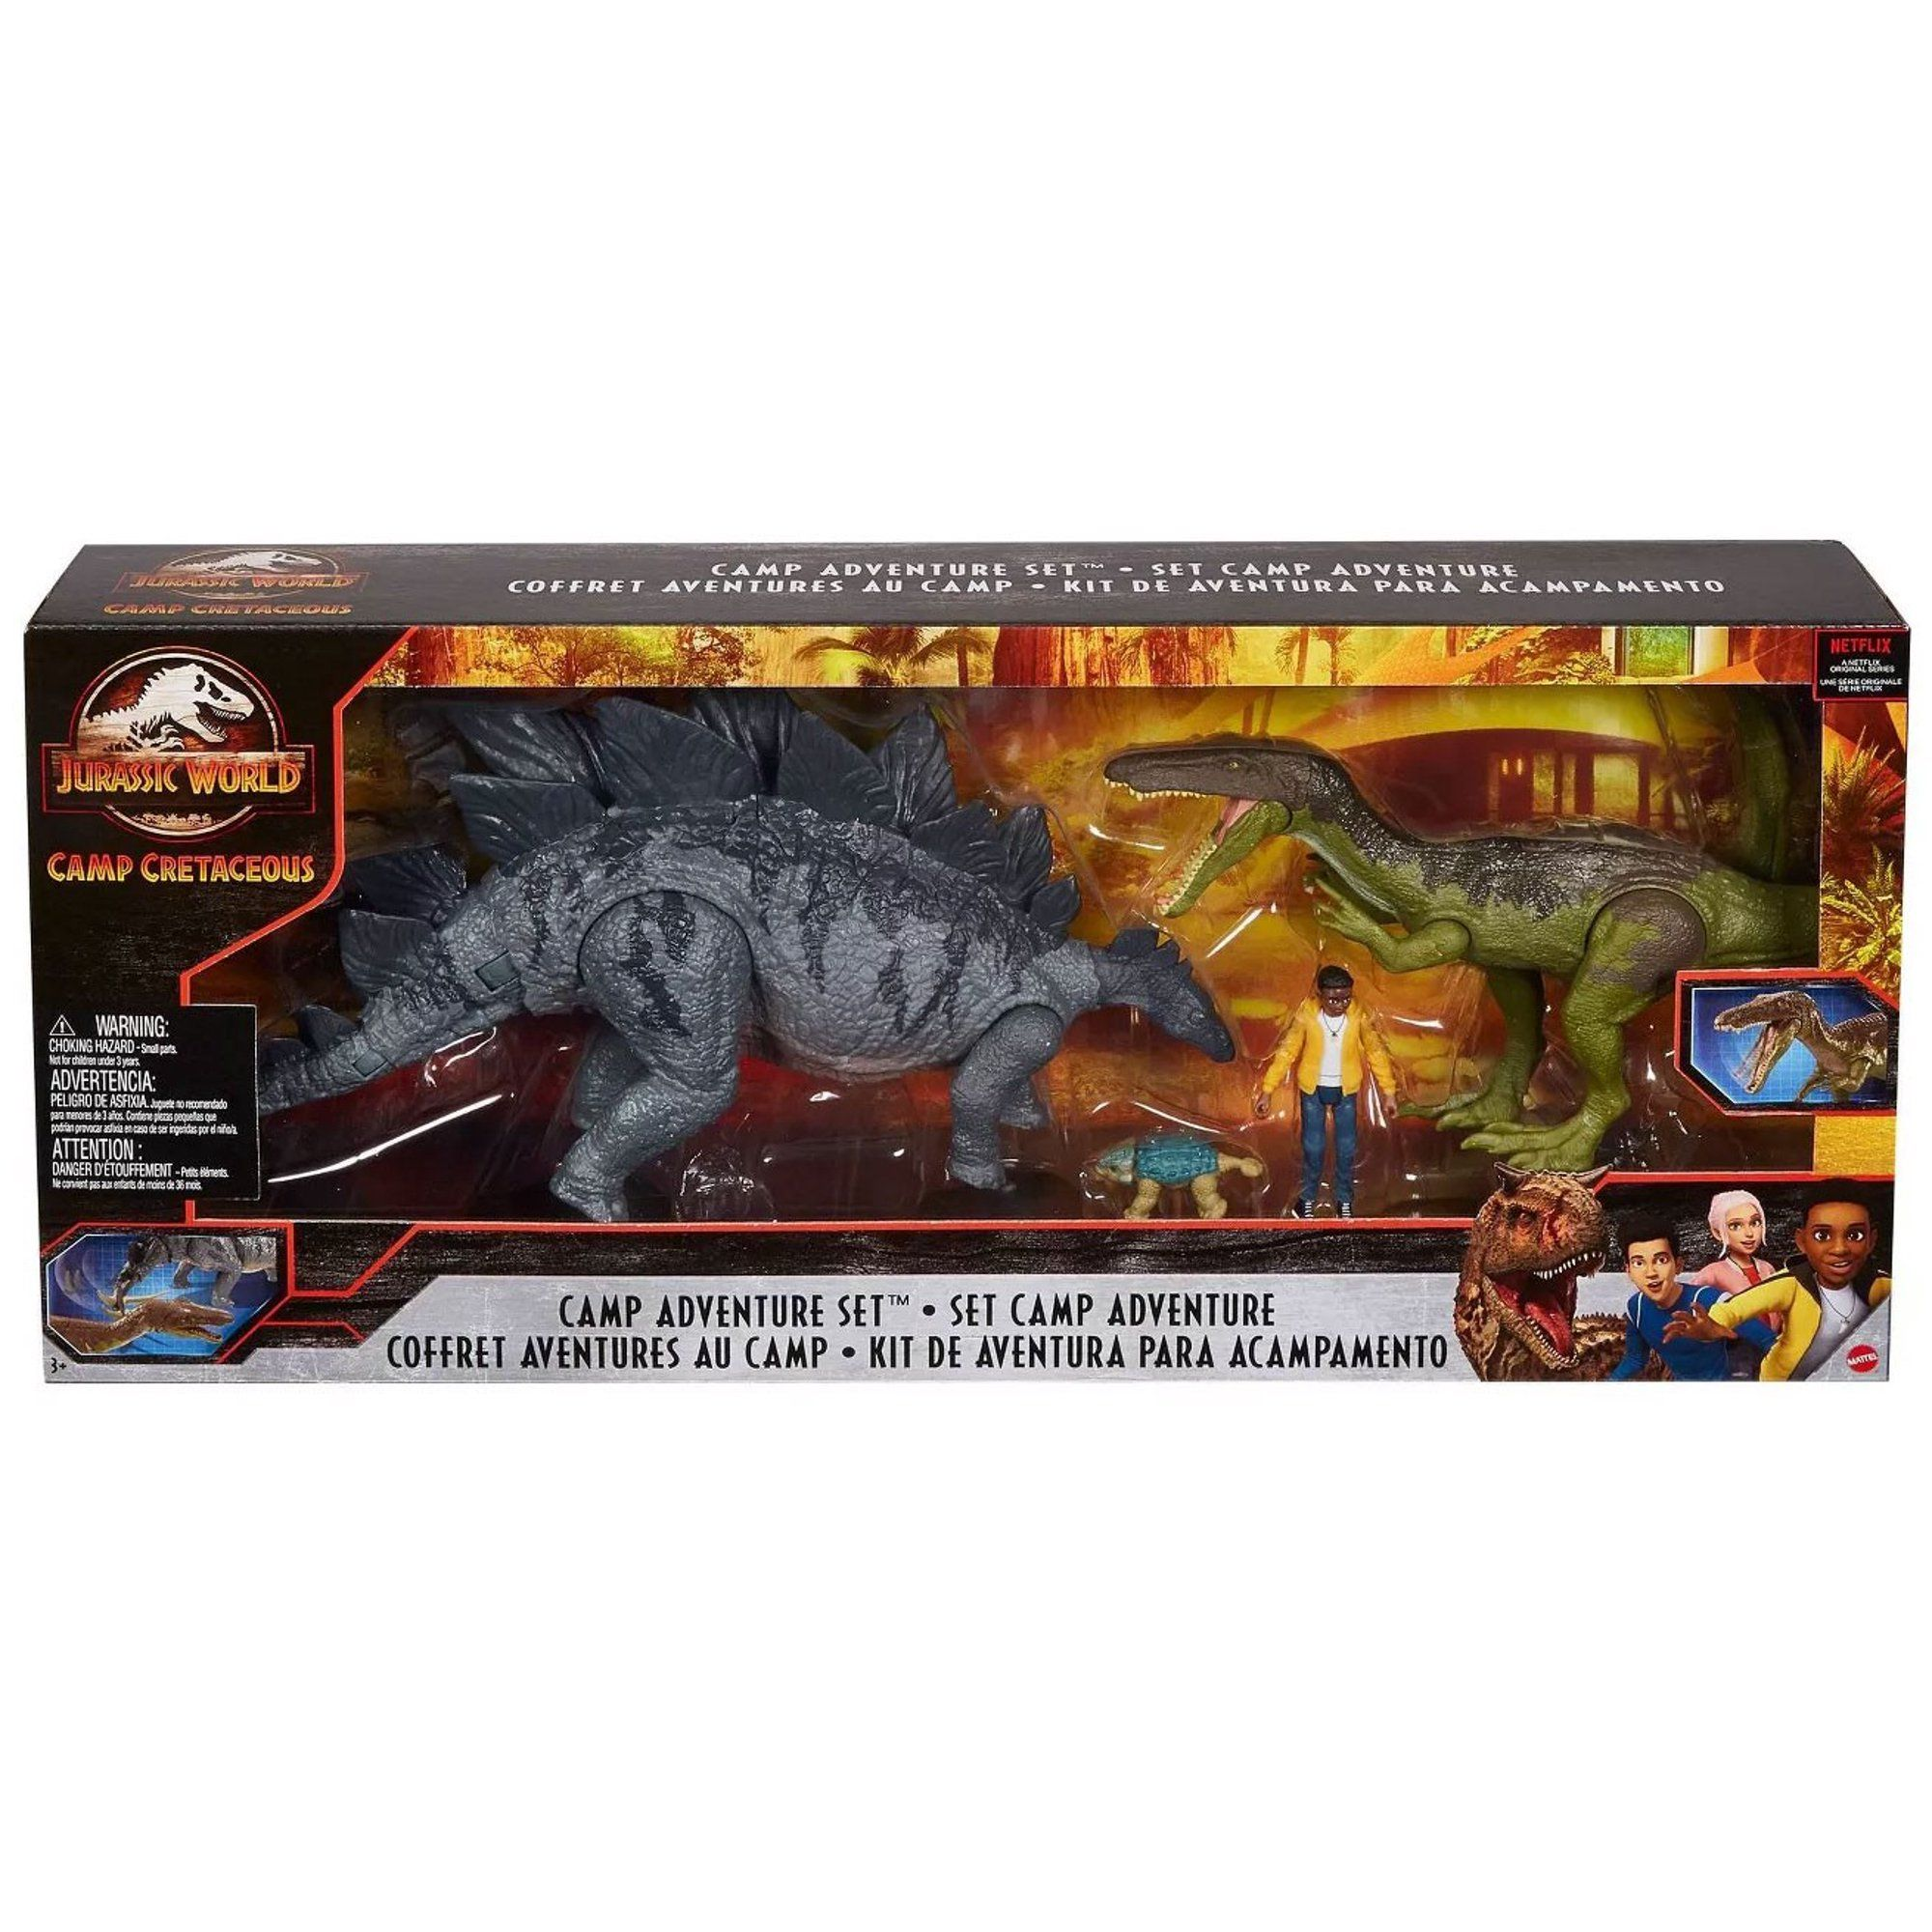 Jurassic World Camp Cretaceous Camp Adventure Set Walmart Com In 2021 Jurassic World Dinosaur Toys Jurassic Park Toys Jurassic World